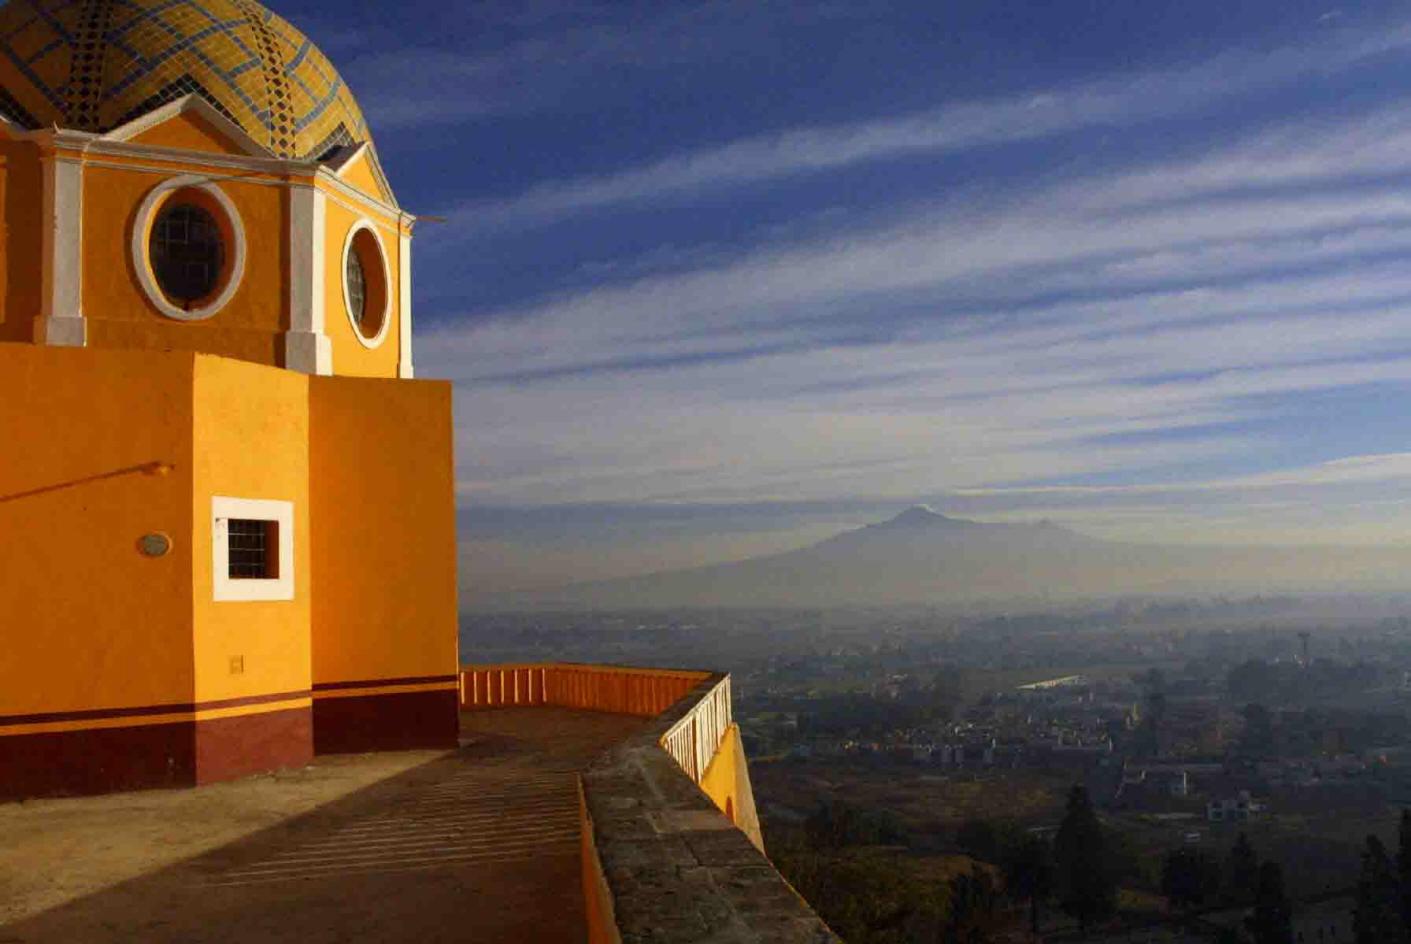 10 Destinos para disfrutar en Pareja por México